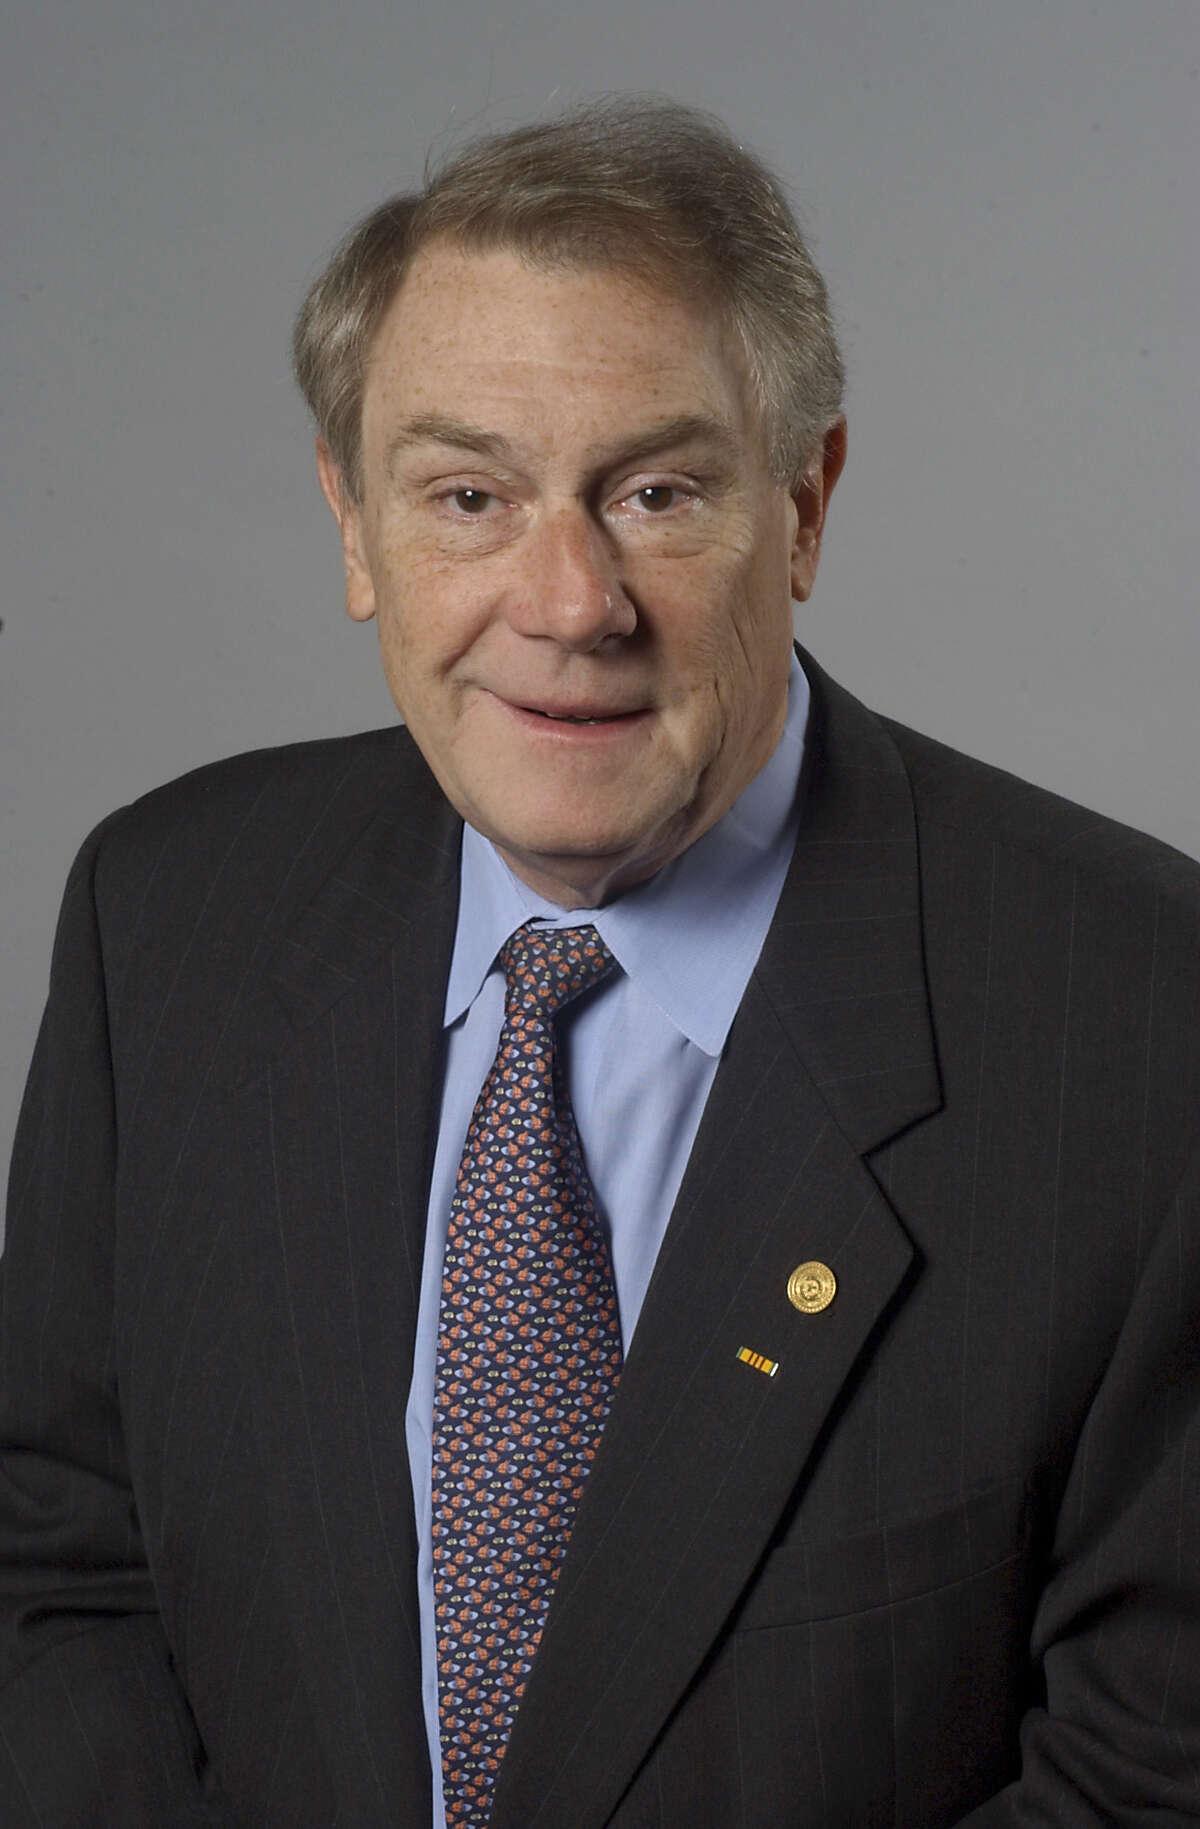 Rep. Wayne Smith, R-Baytown, on Tuesday, February 1, 2005. (AP Photo)